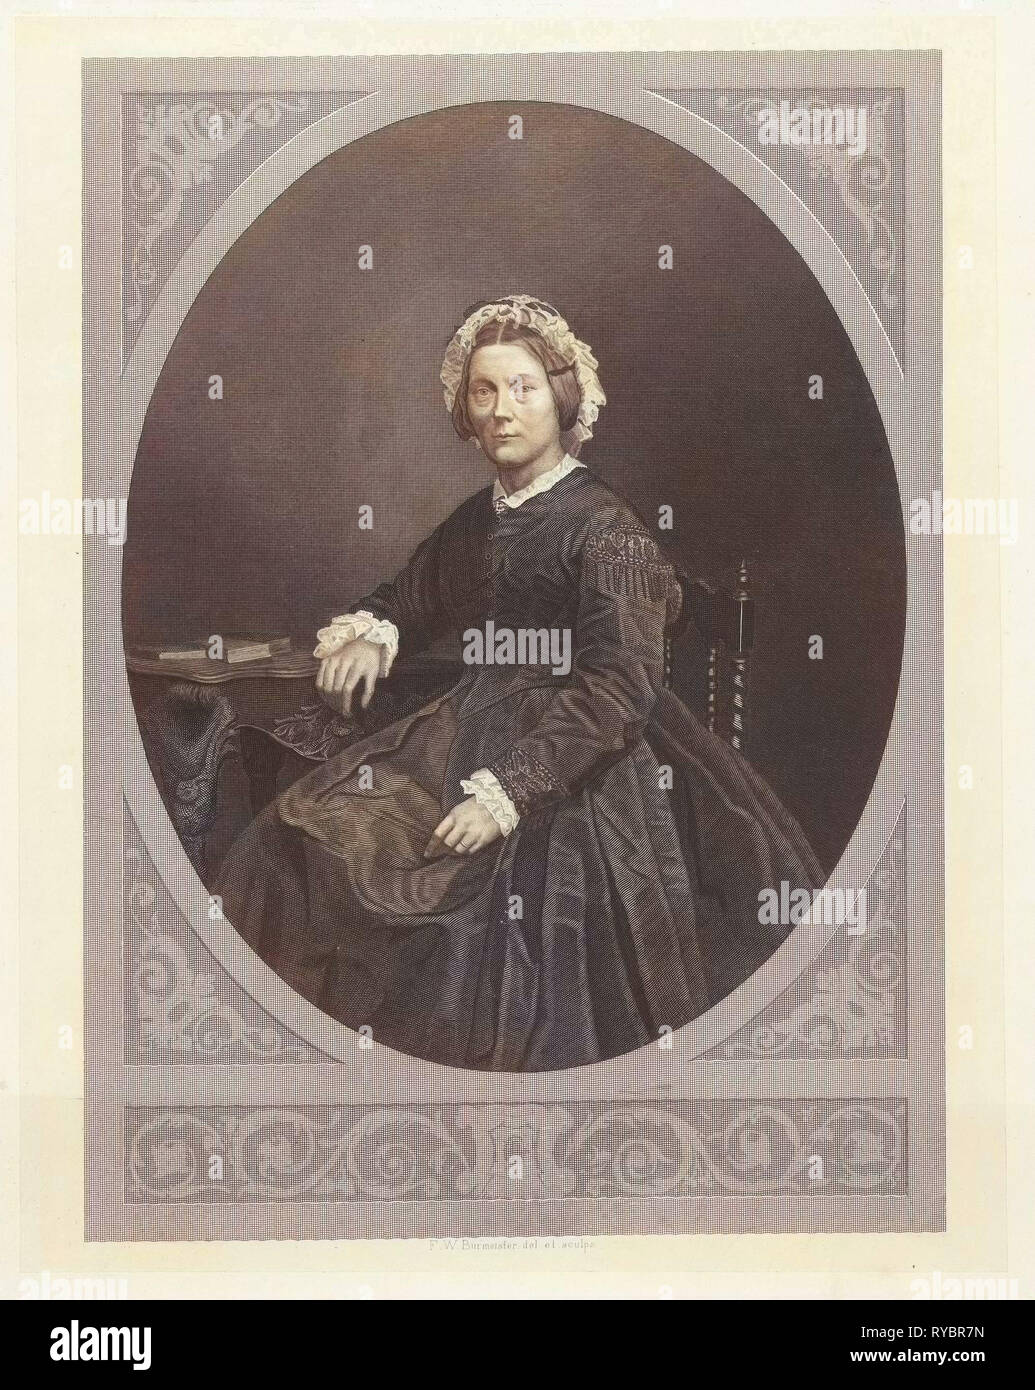 Portrait of Emma Boissevain - Nicholls, Friedrich Wilhelm Burmeister, 1855 - 1915 - Stock Image